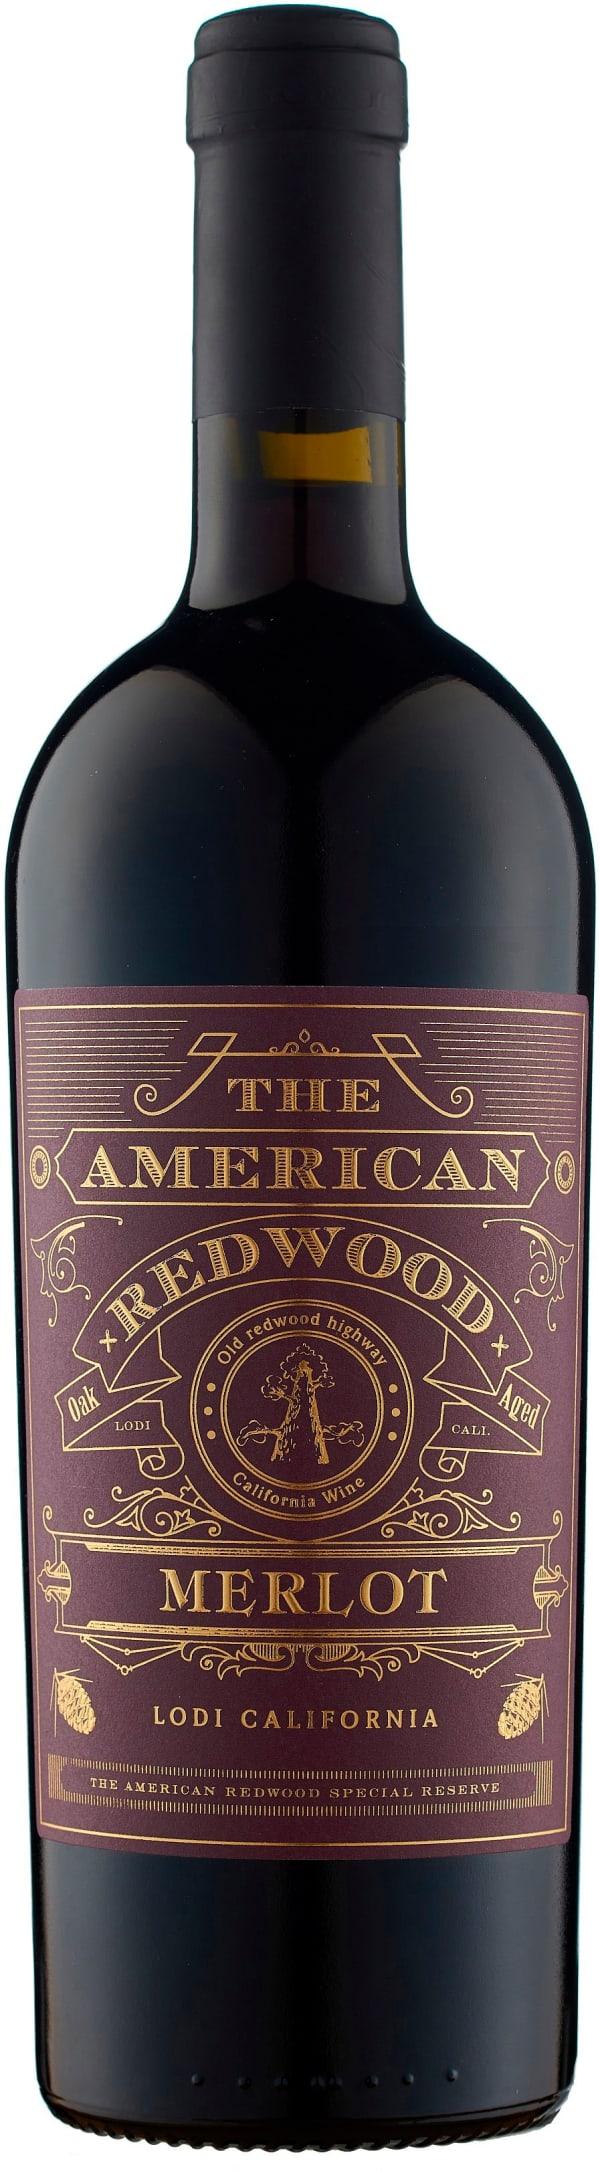 American Redwood Merlot 2016